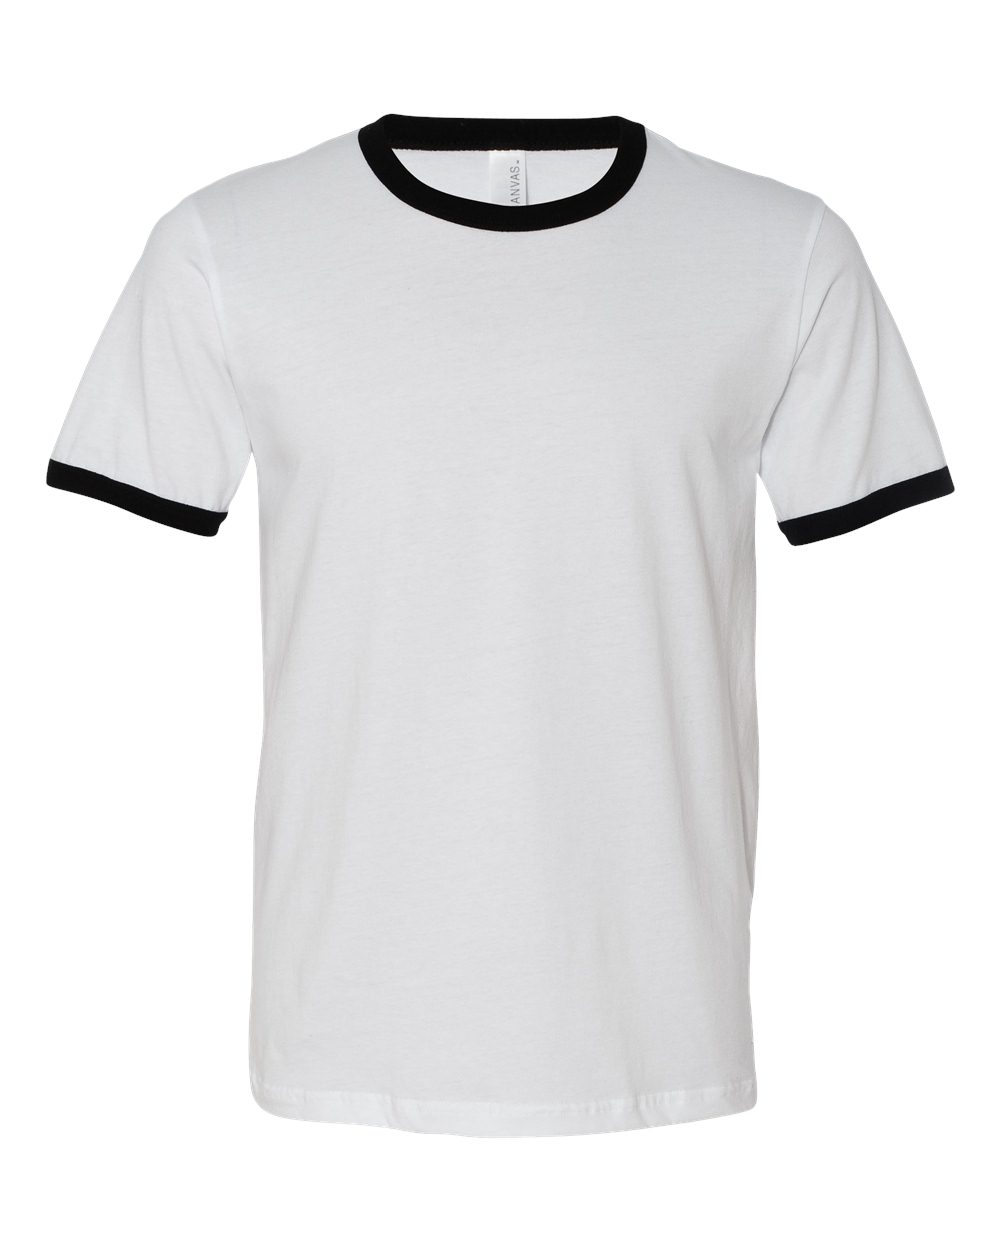 click to view White/ Black